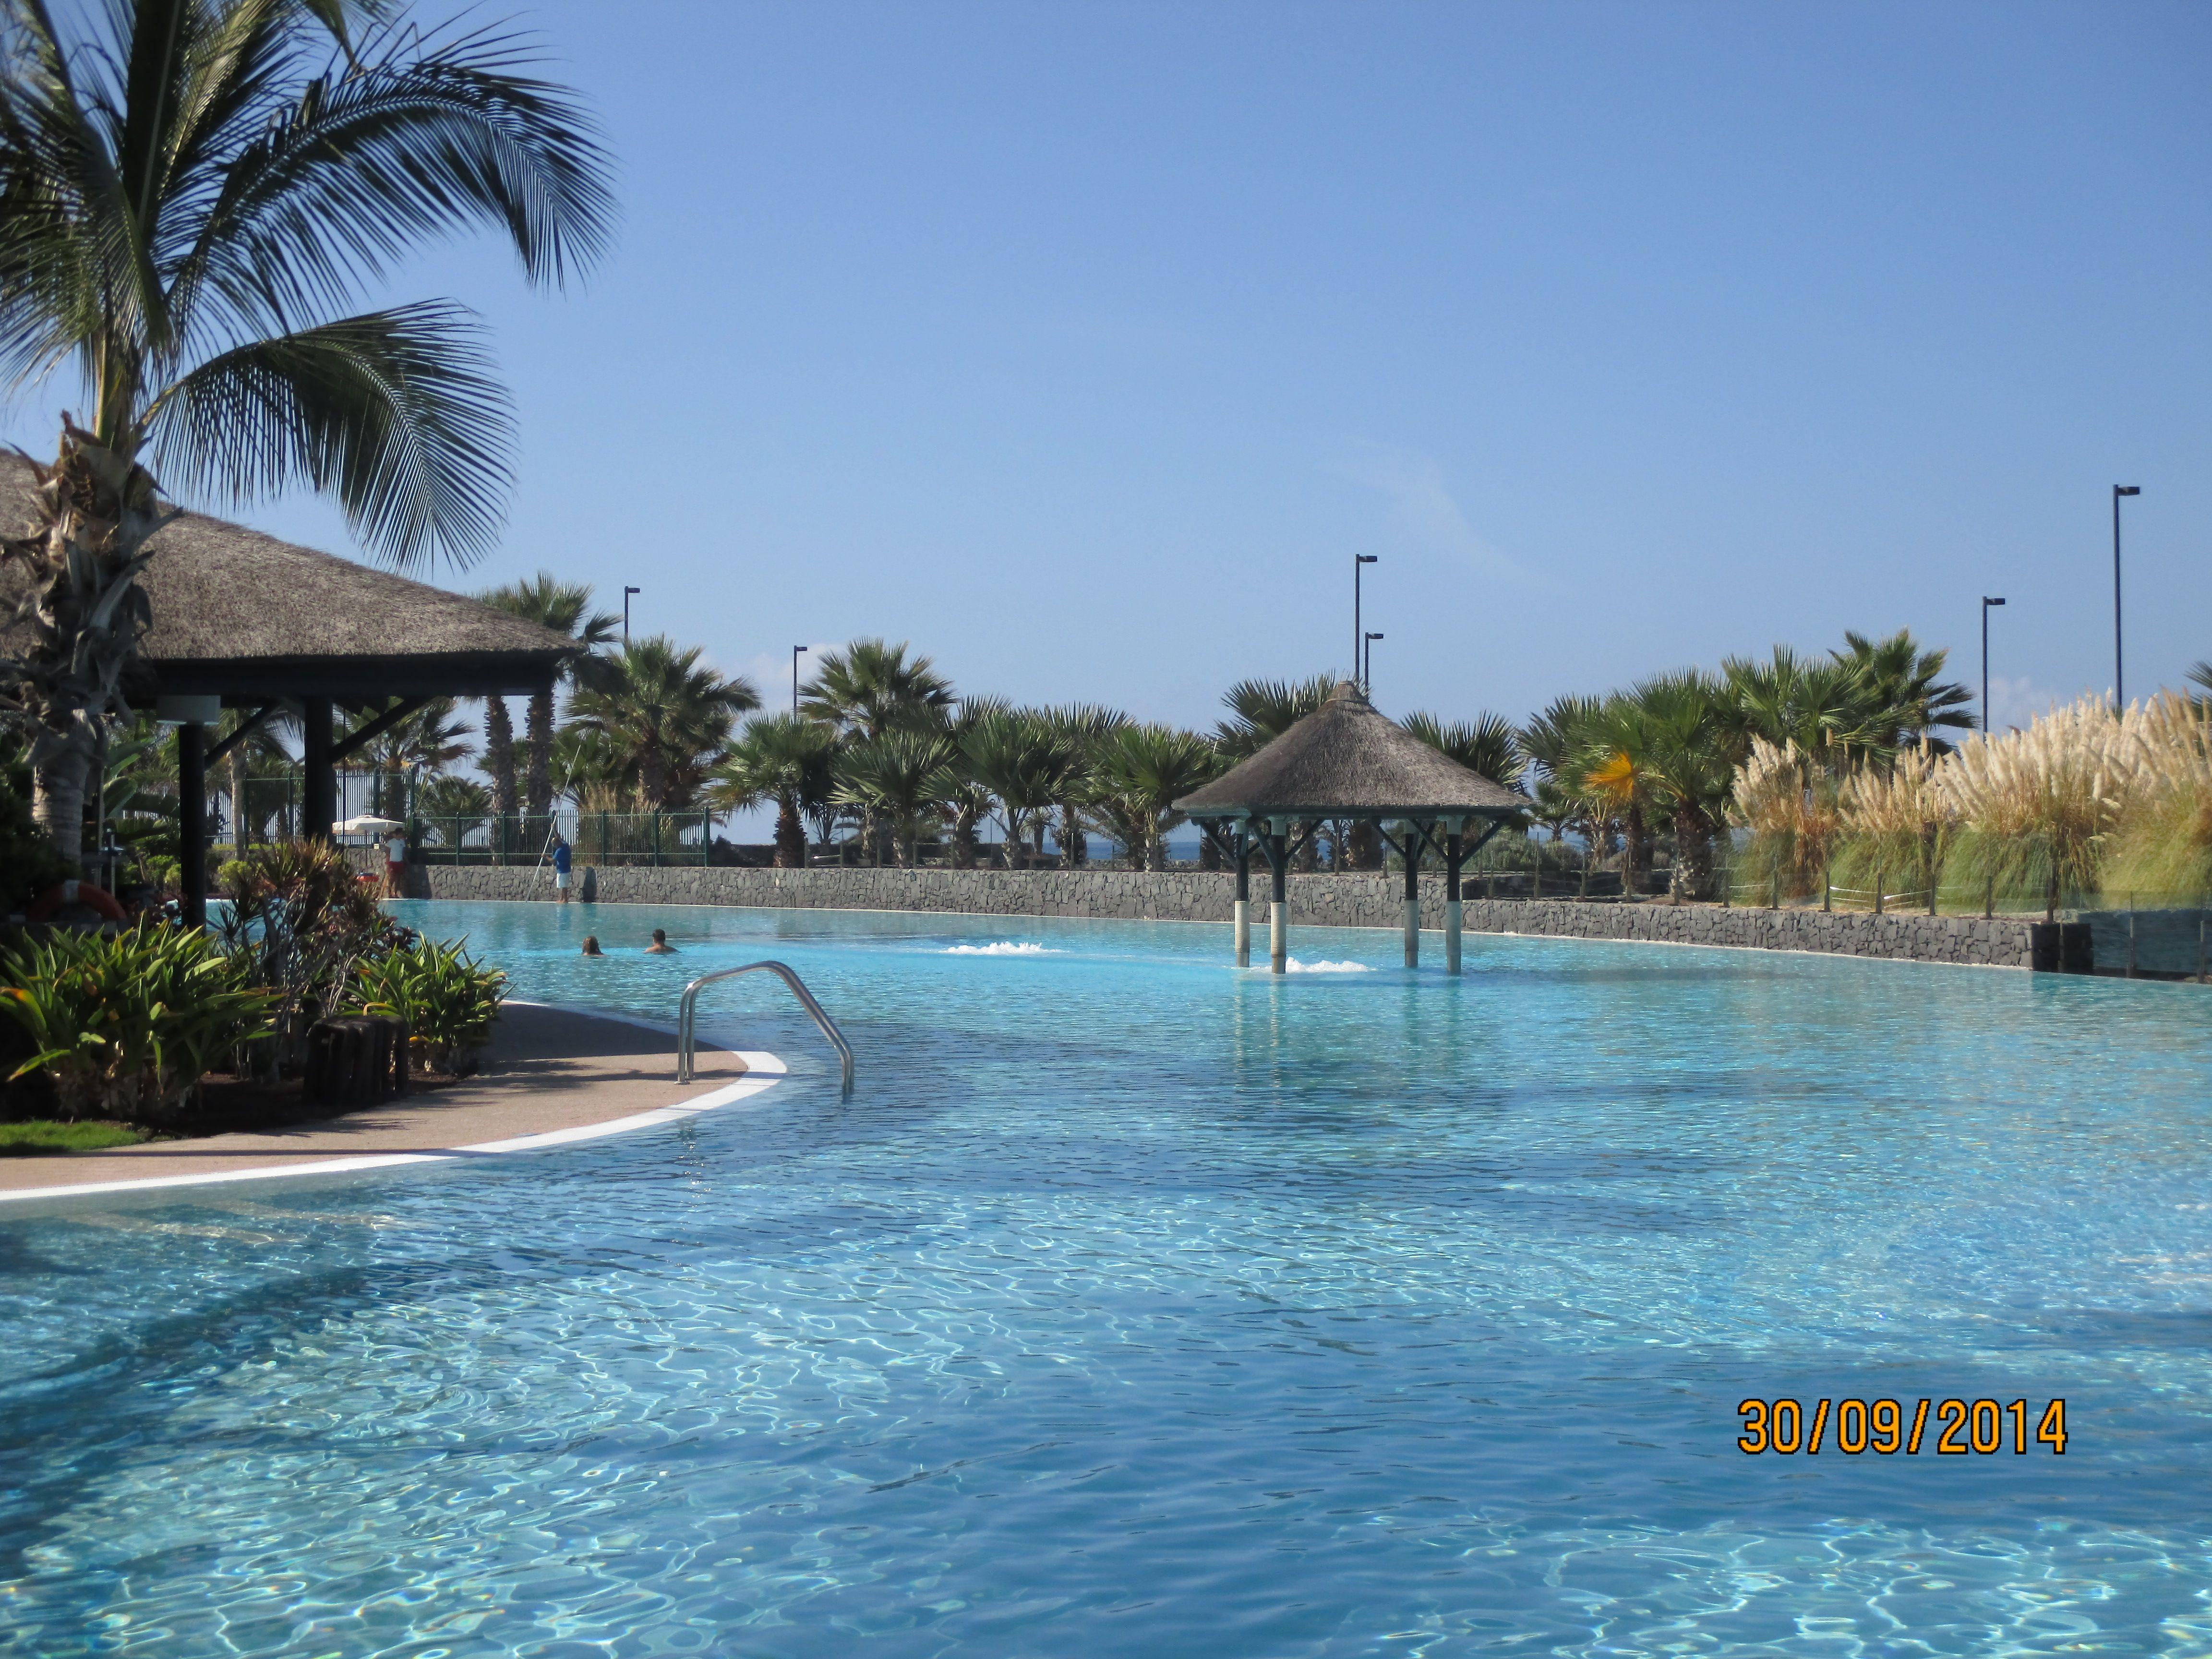 Melia Hotel Las Gigantas Infinity Pool3